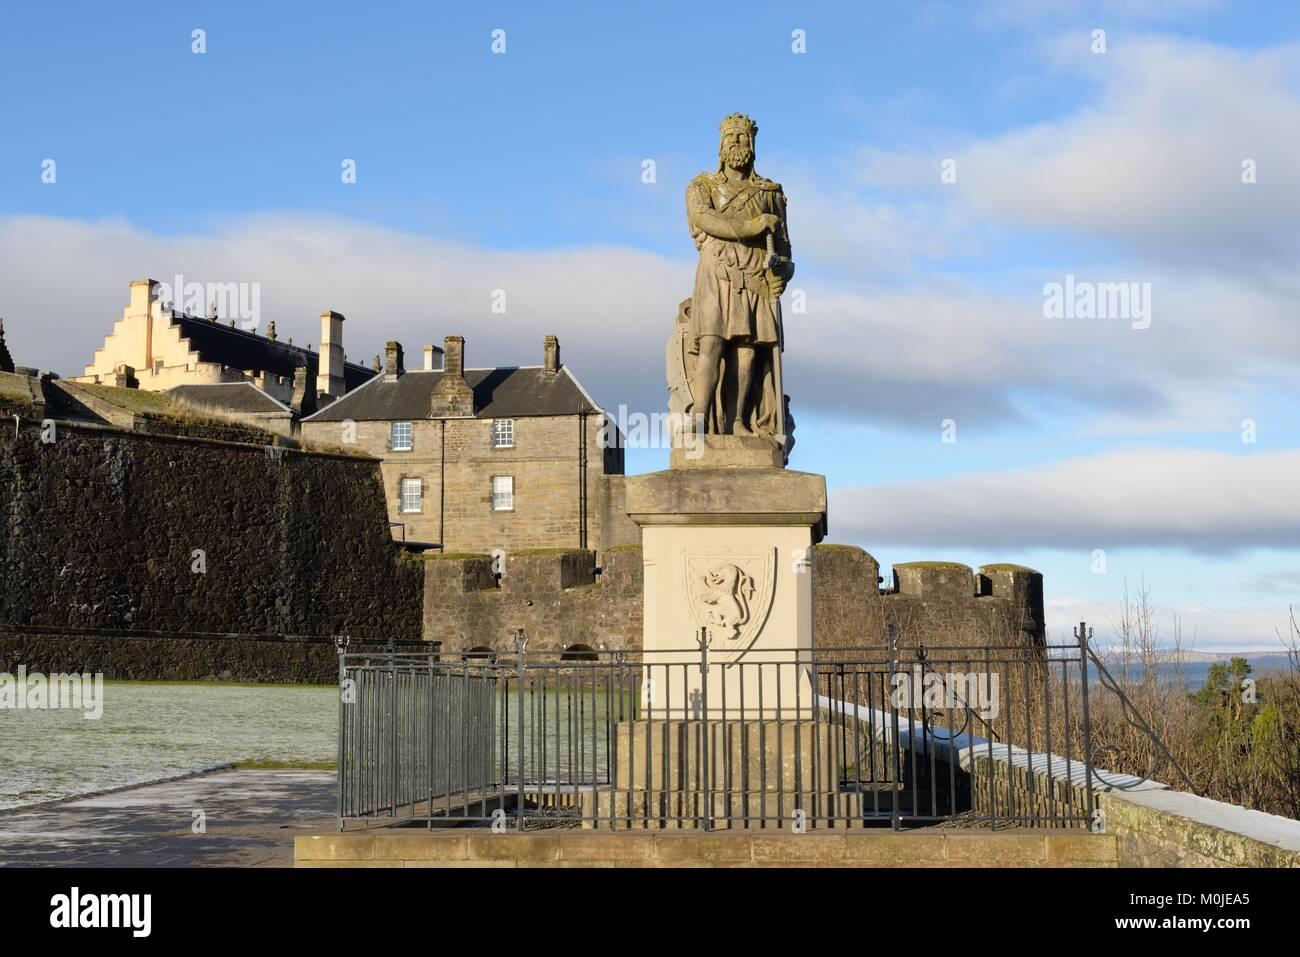 Refurbished statue of King Robert Bruce on the esplanade at Stirling Castle, Scotland, UK Stock Photo